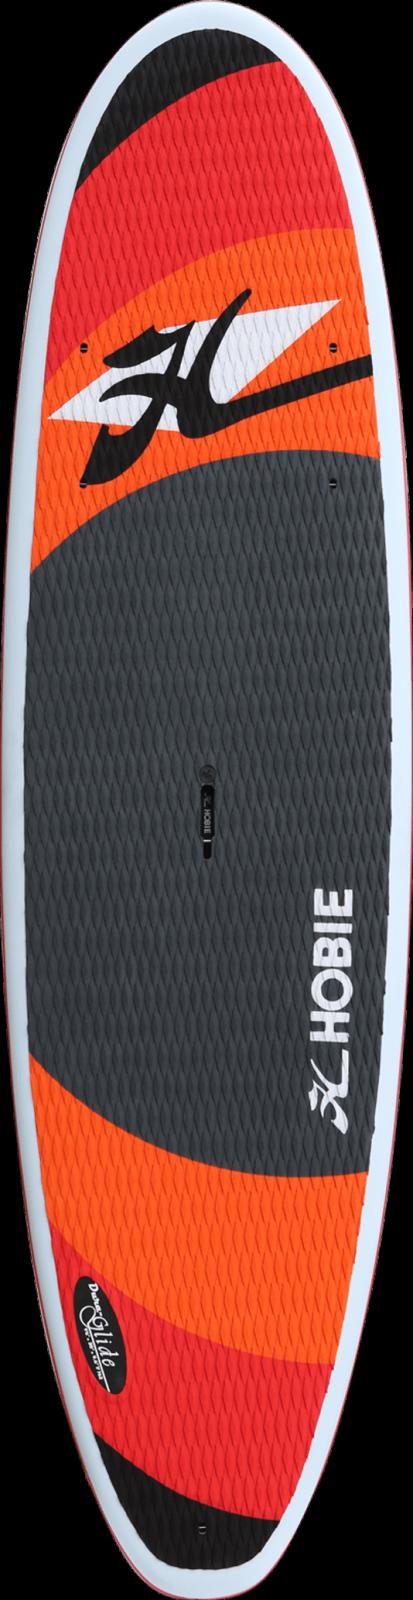 Hobie 9-6 Dura-Glide Paddle Board